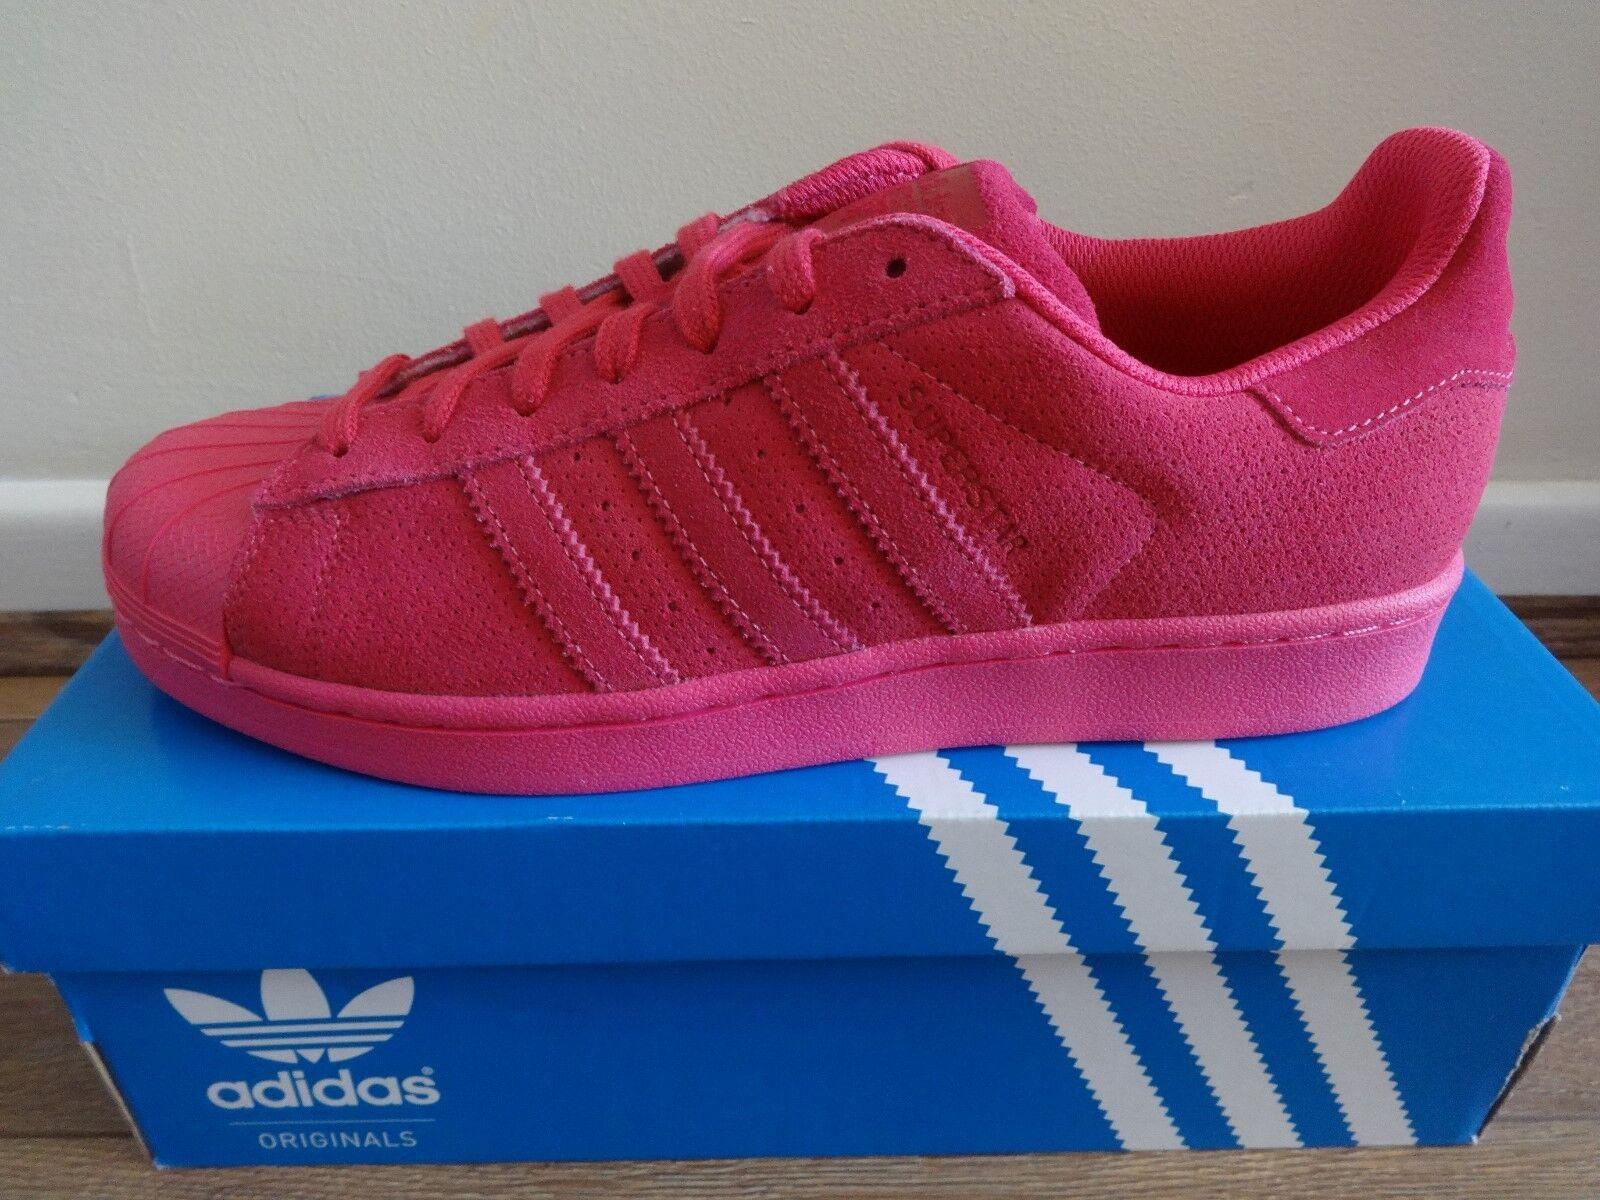 Adidas Originals Superstar RT Hombres Para Hombres RT Tenis Tenis Zapatos AQ4166 Nuevo + Caja 7ab328